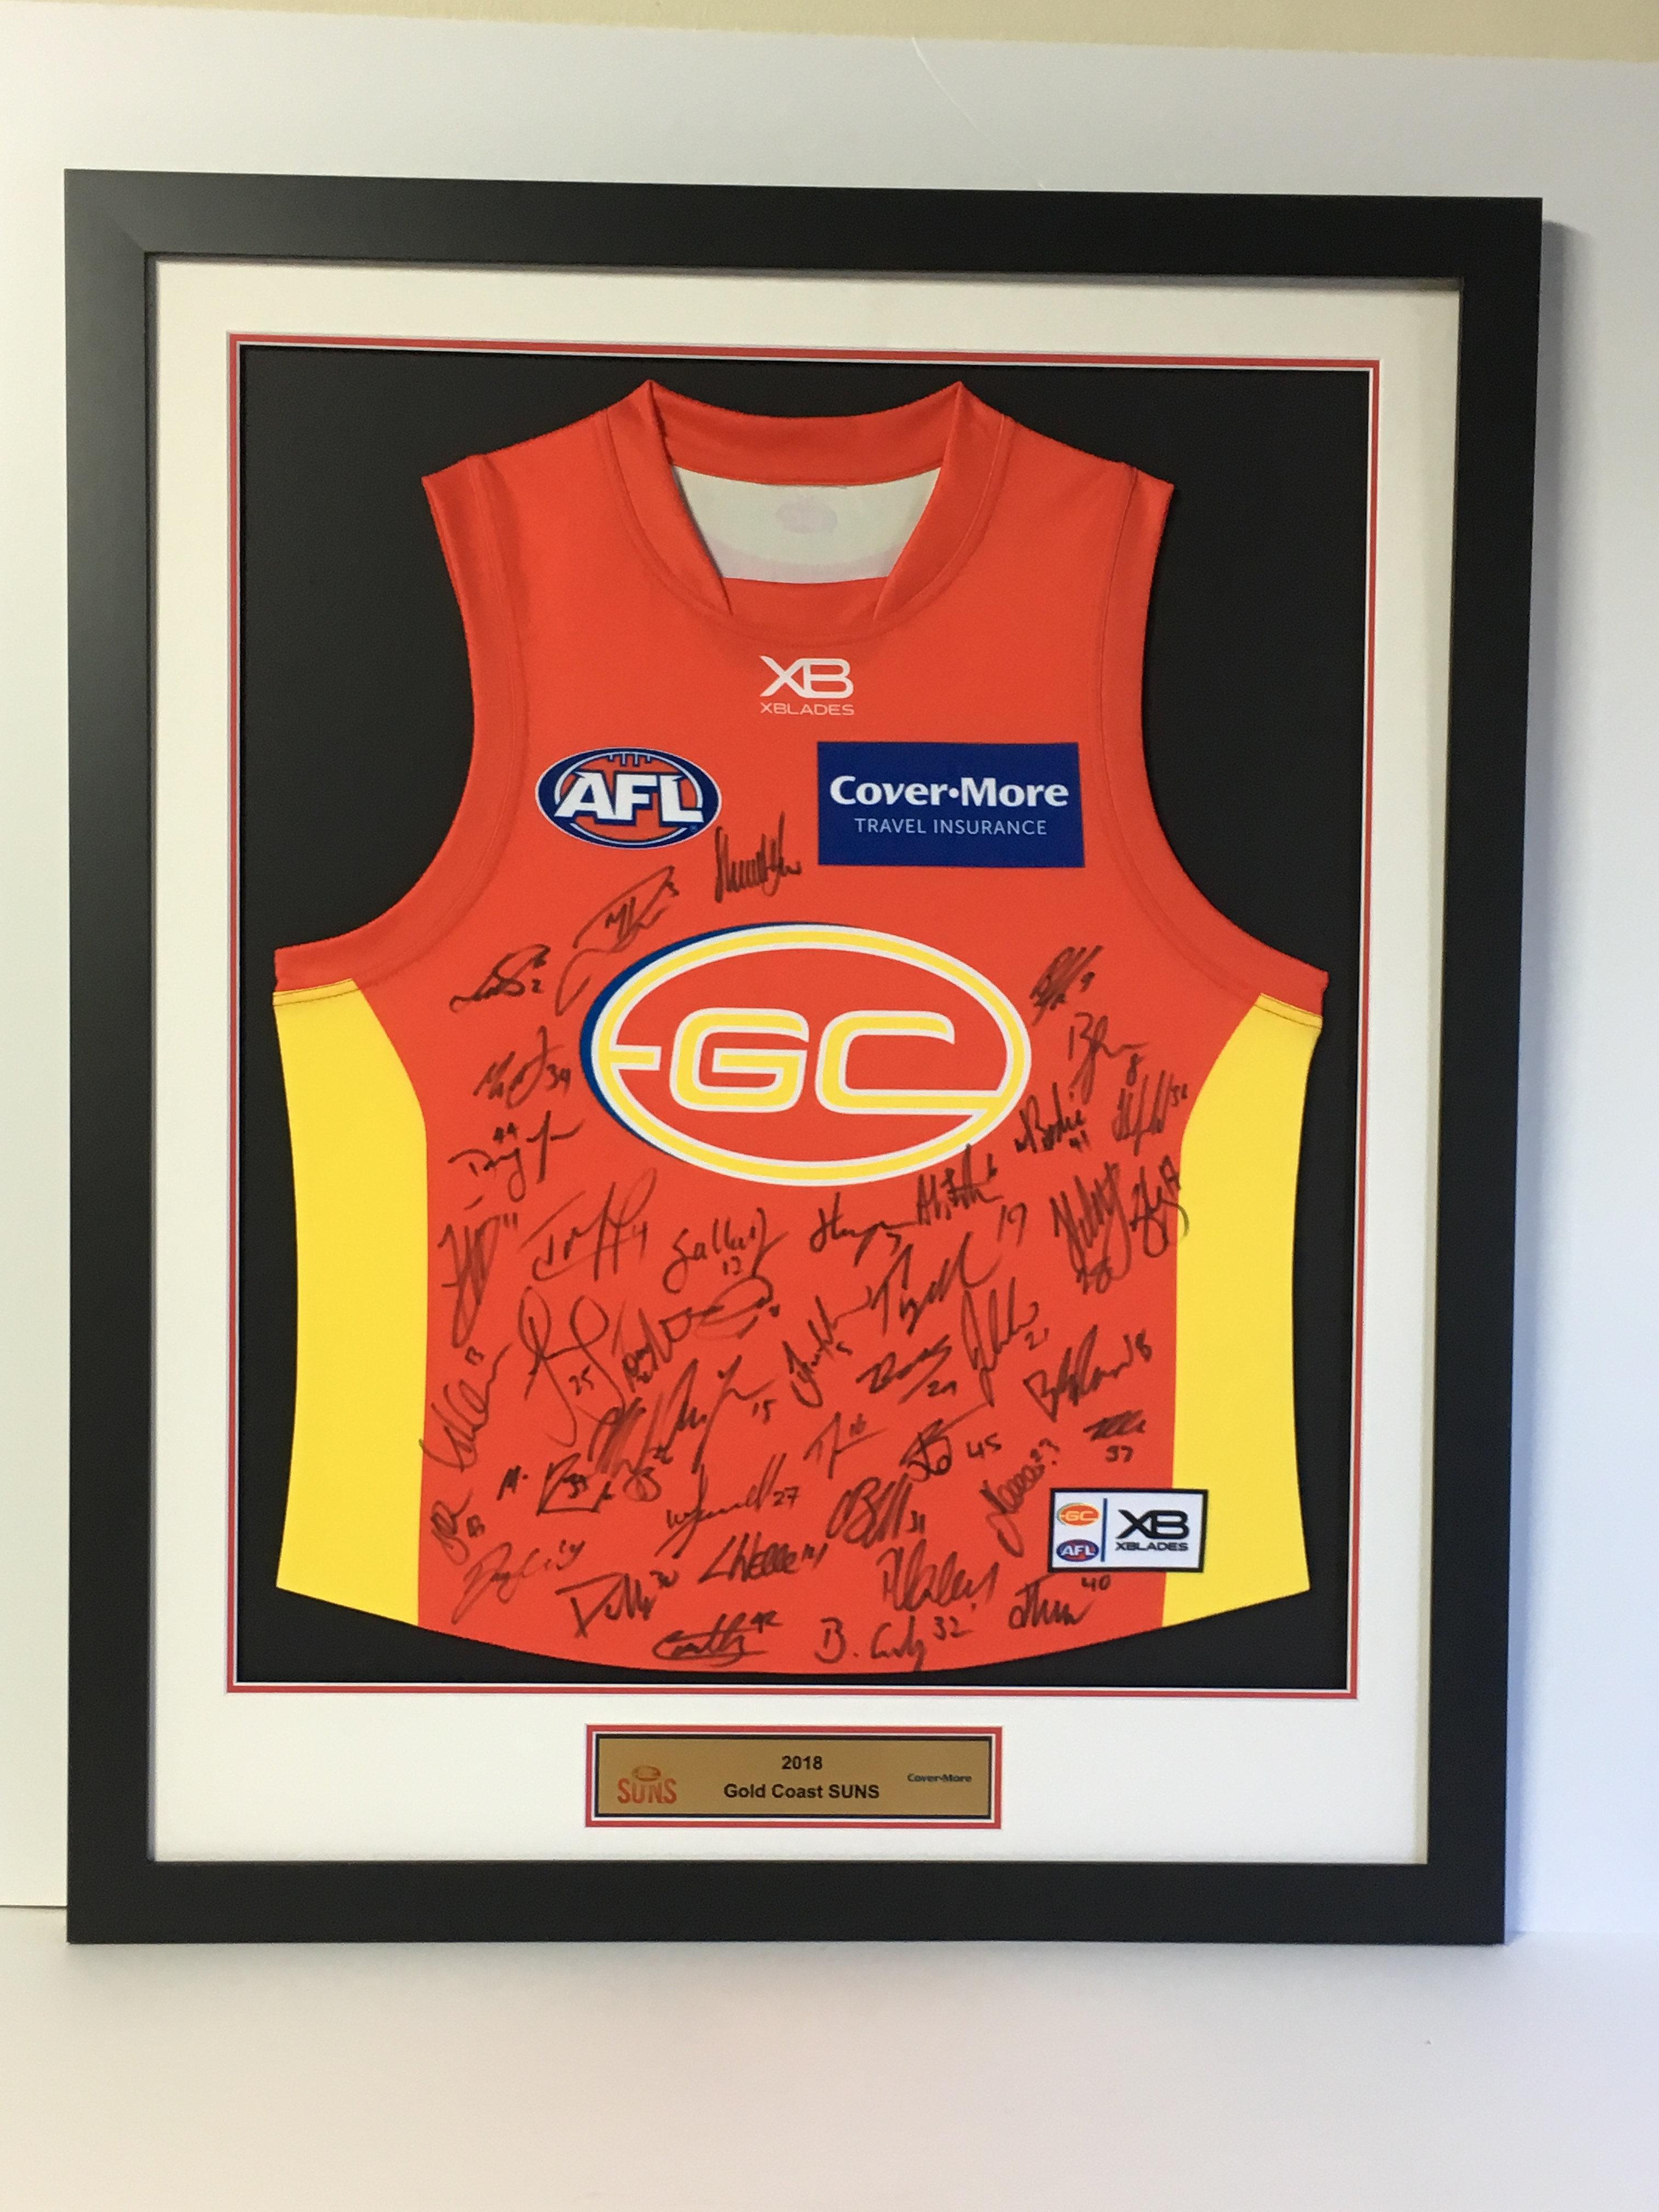 Legends Under Glass   Chatswood   Framing   Gold Coast Suns